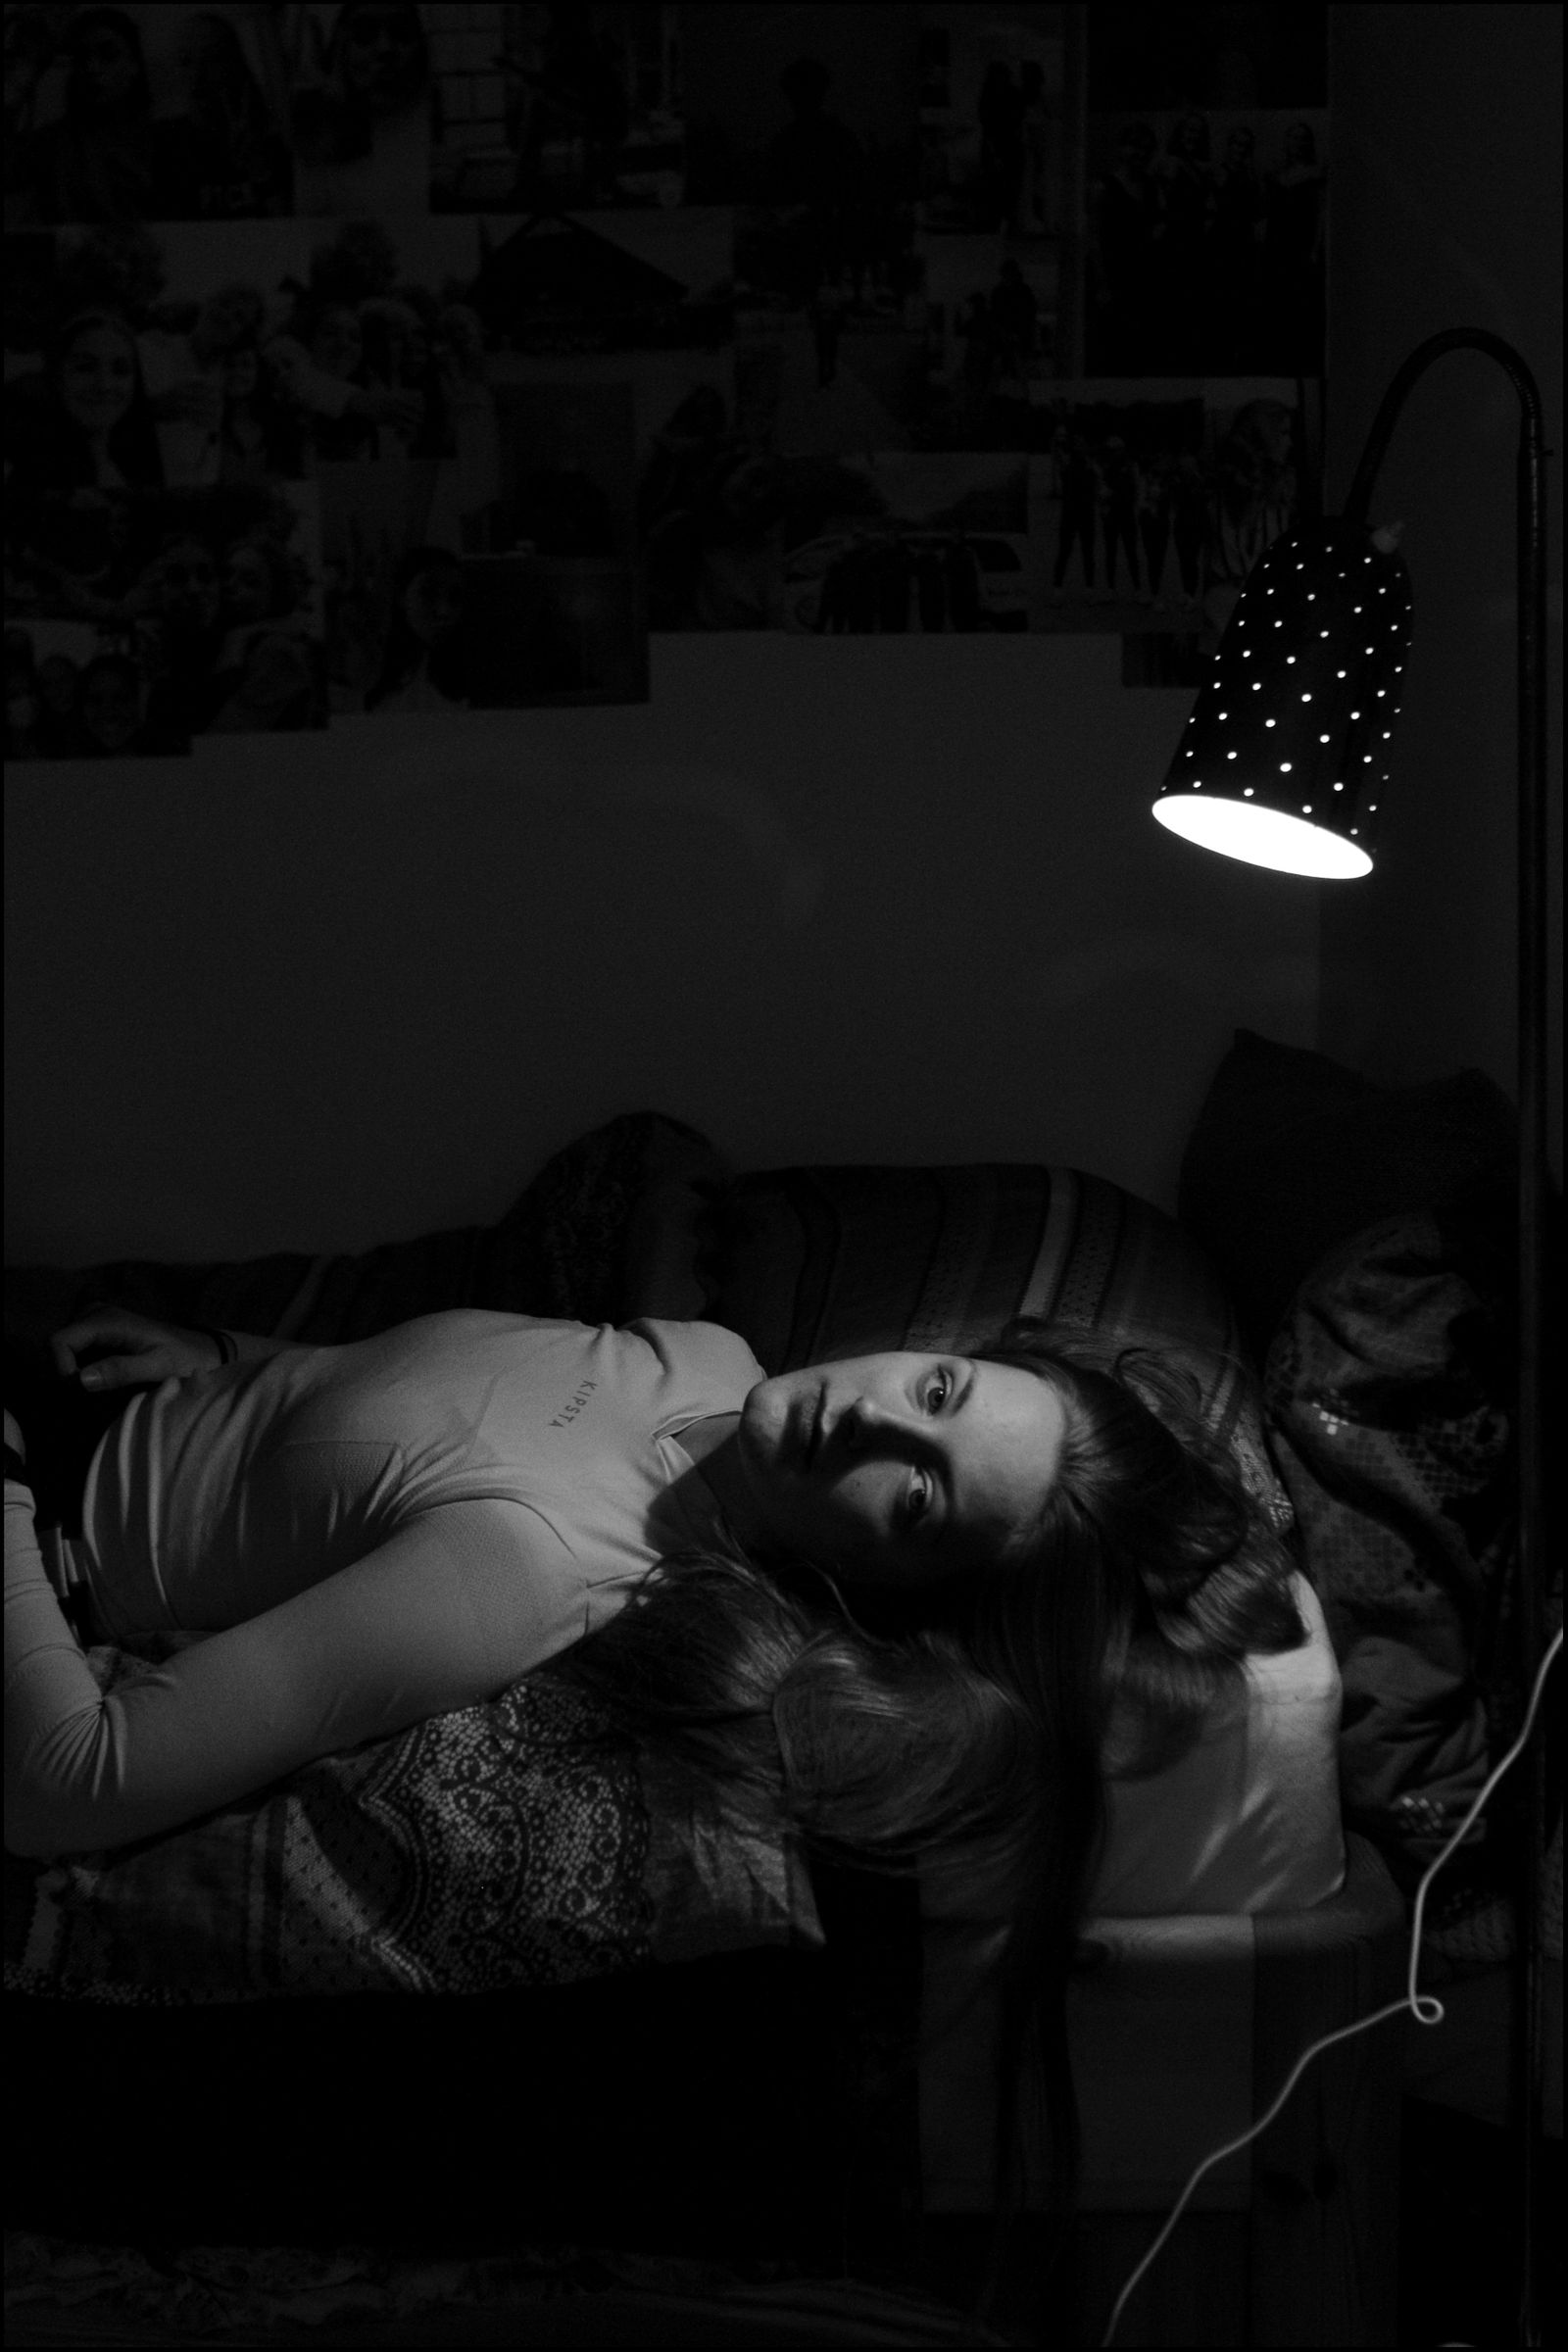 Verlorene-Jugend-AVA-Rebecca-Hoppé-IMG_3659